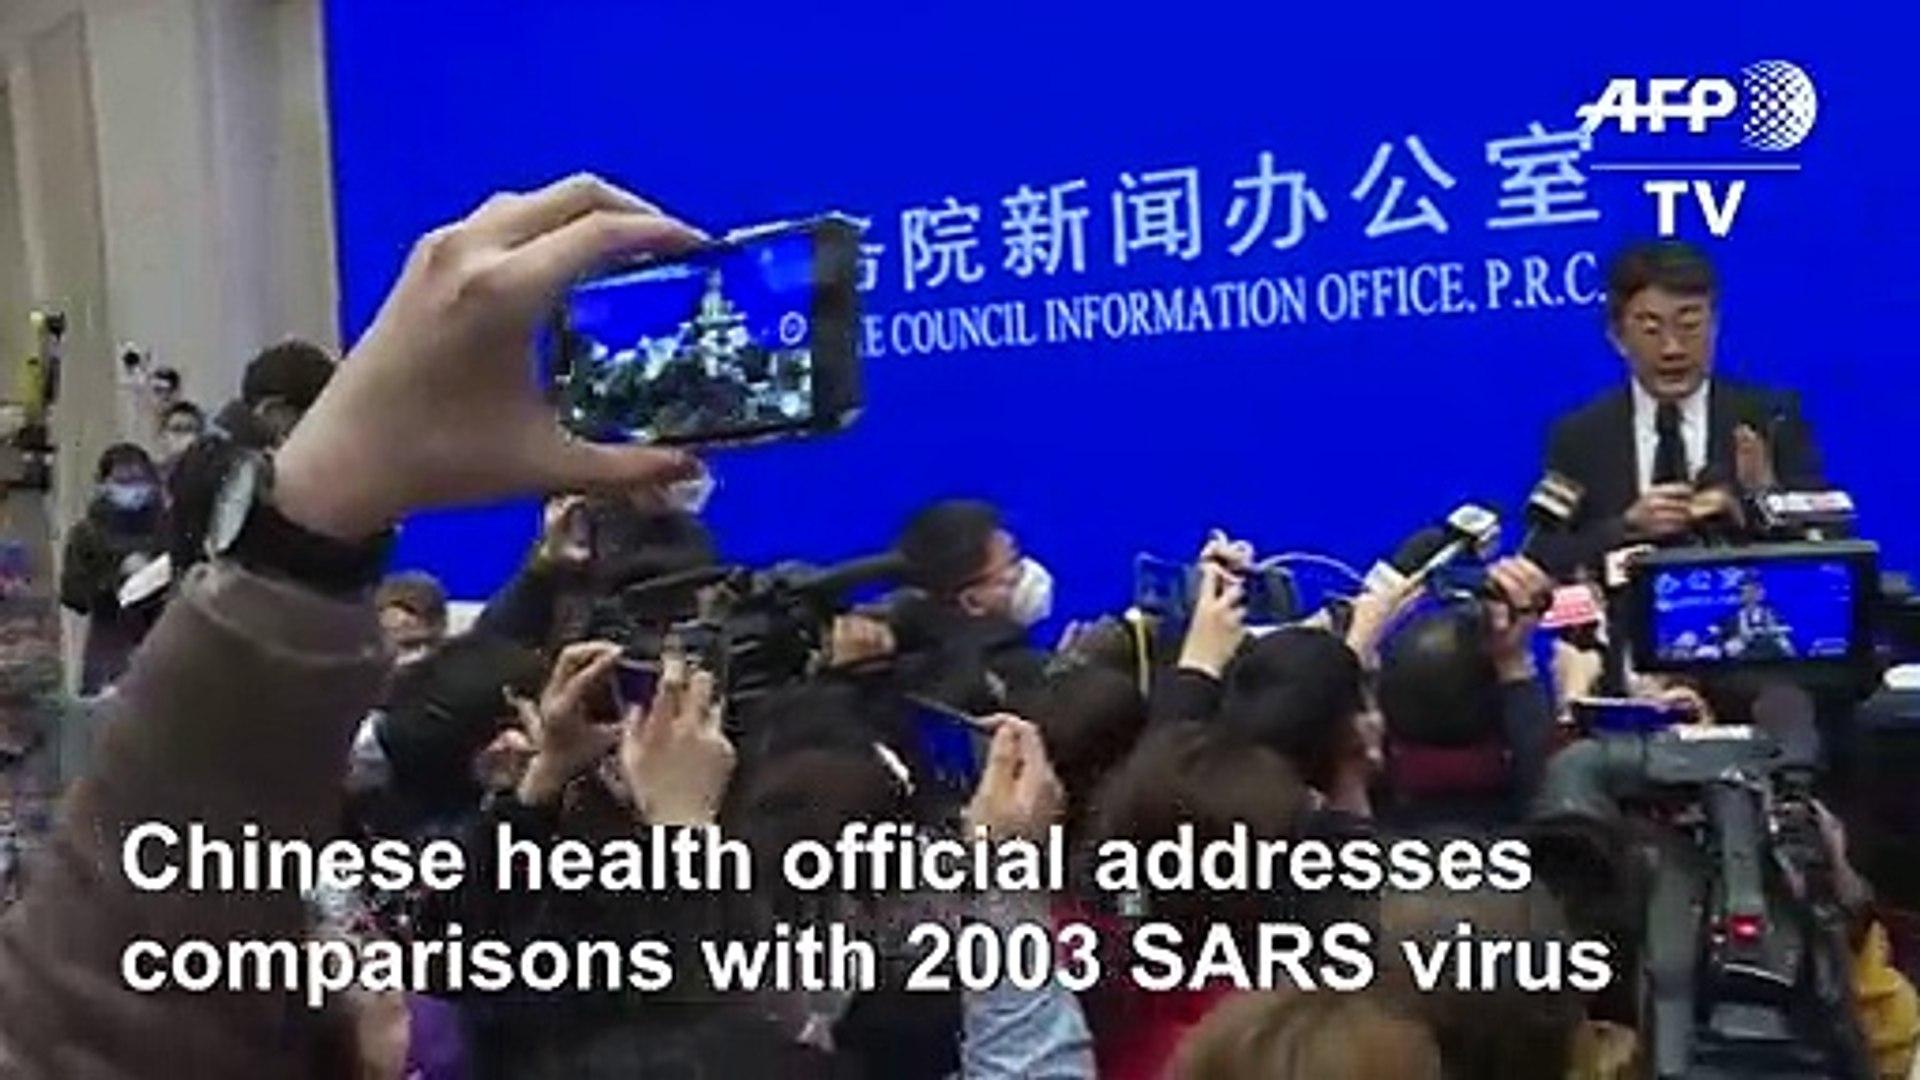 New China virus 'not as powerful as SARS'